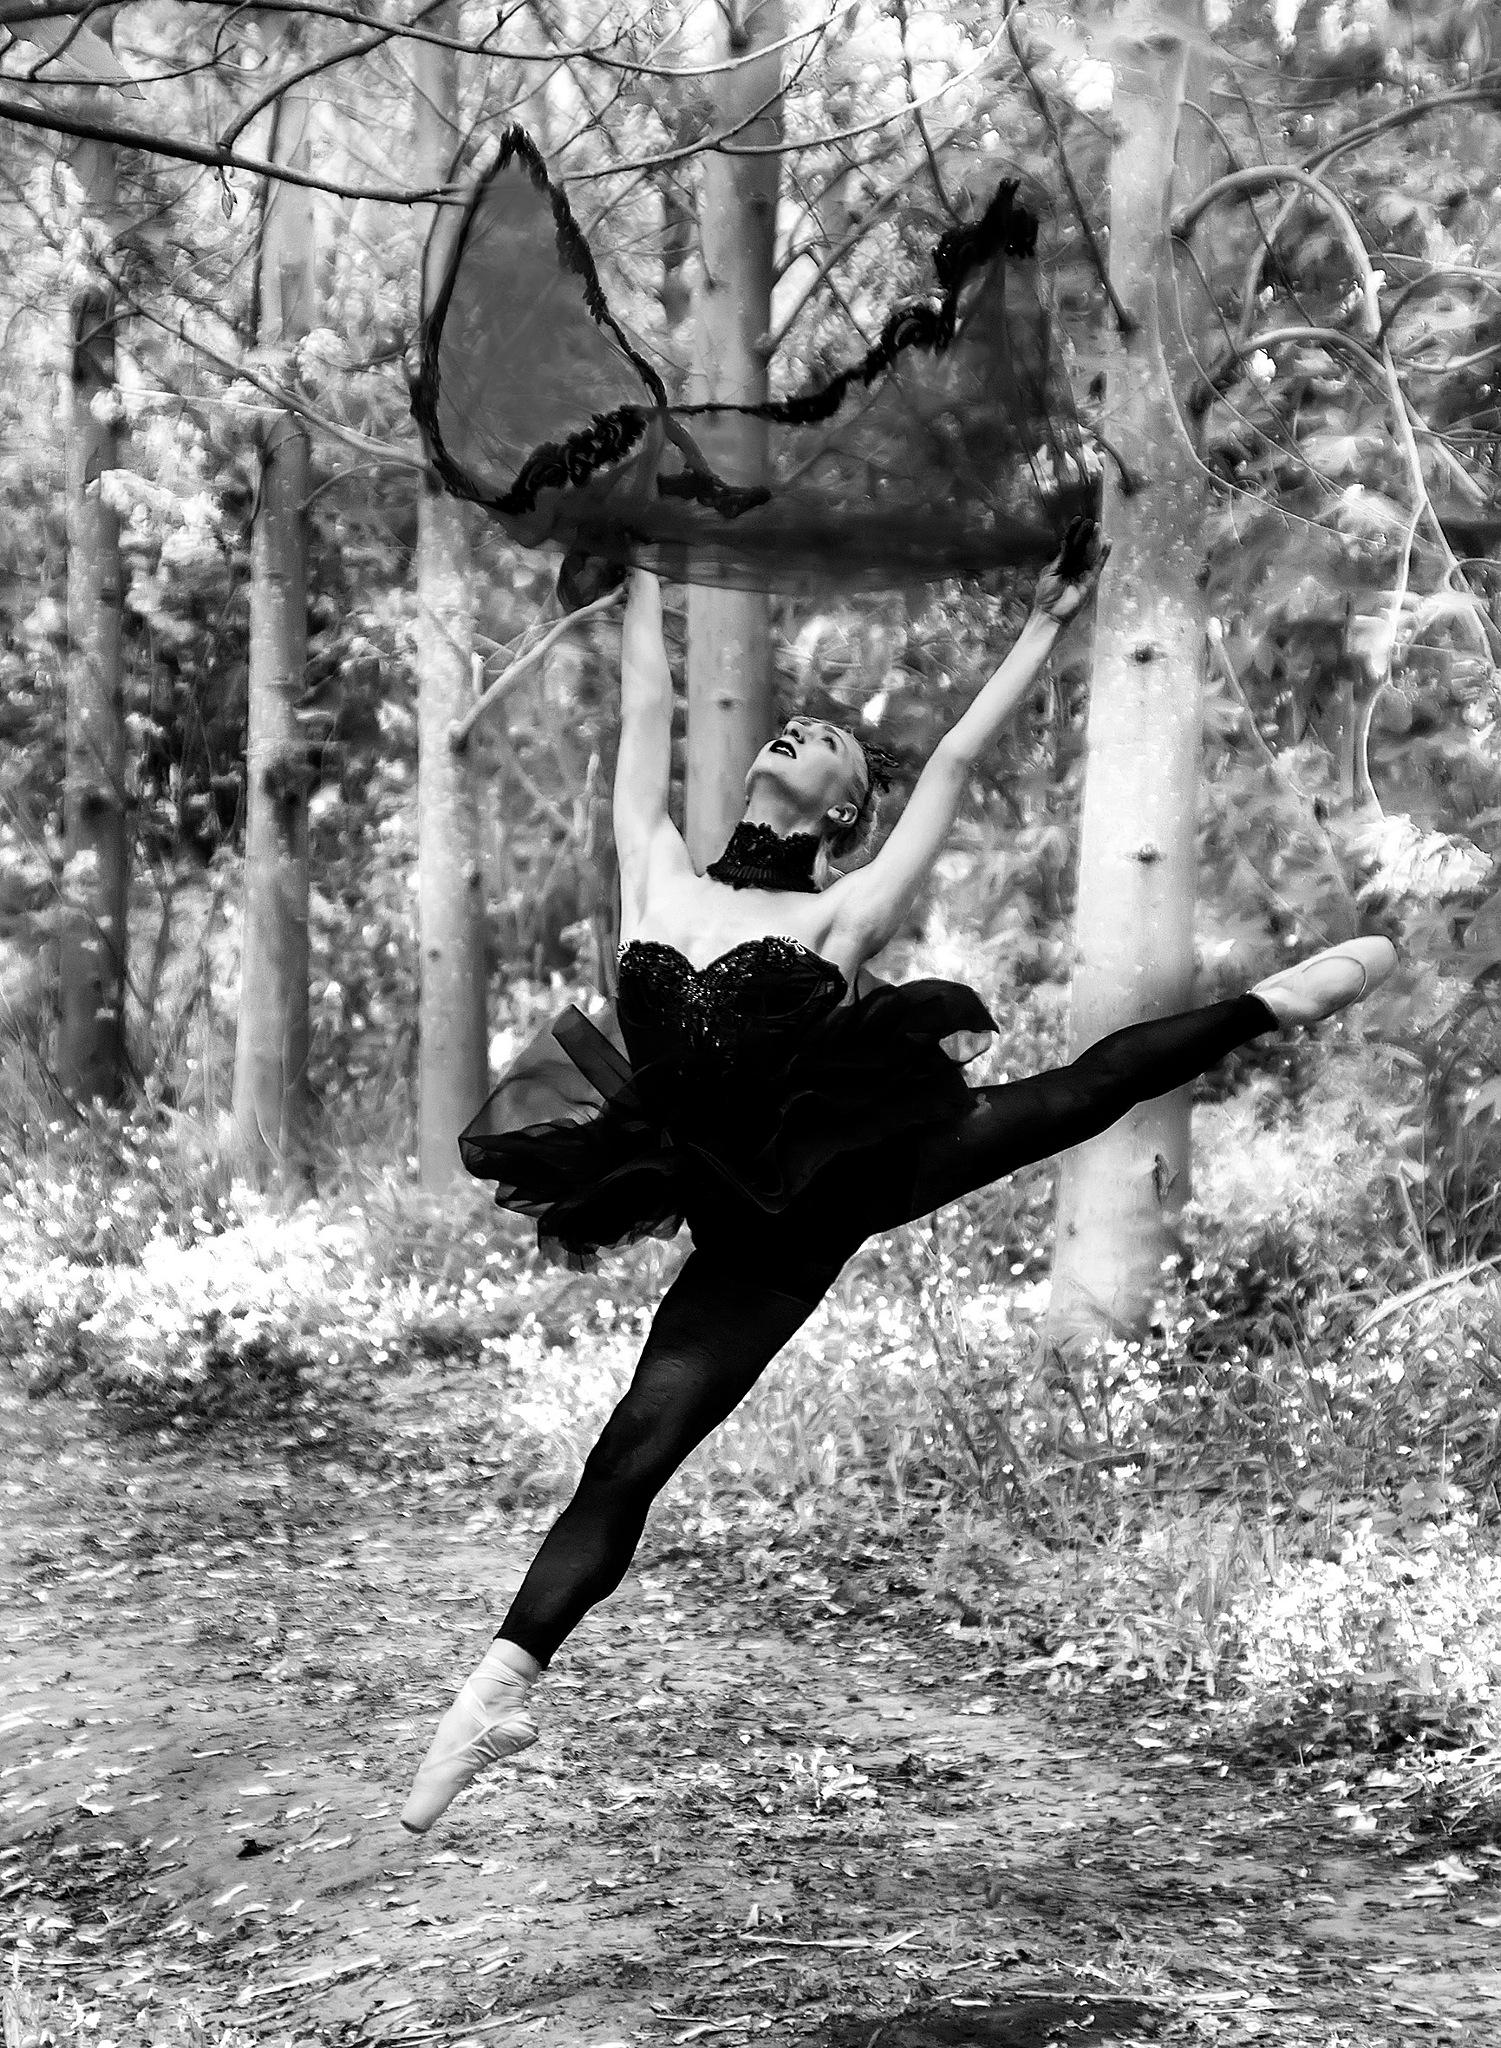 Up in the air in monochrome by Rebecca Danieli